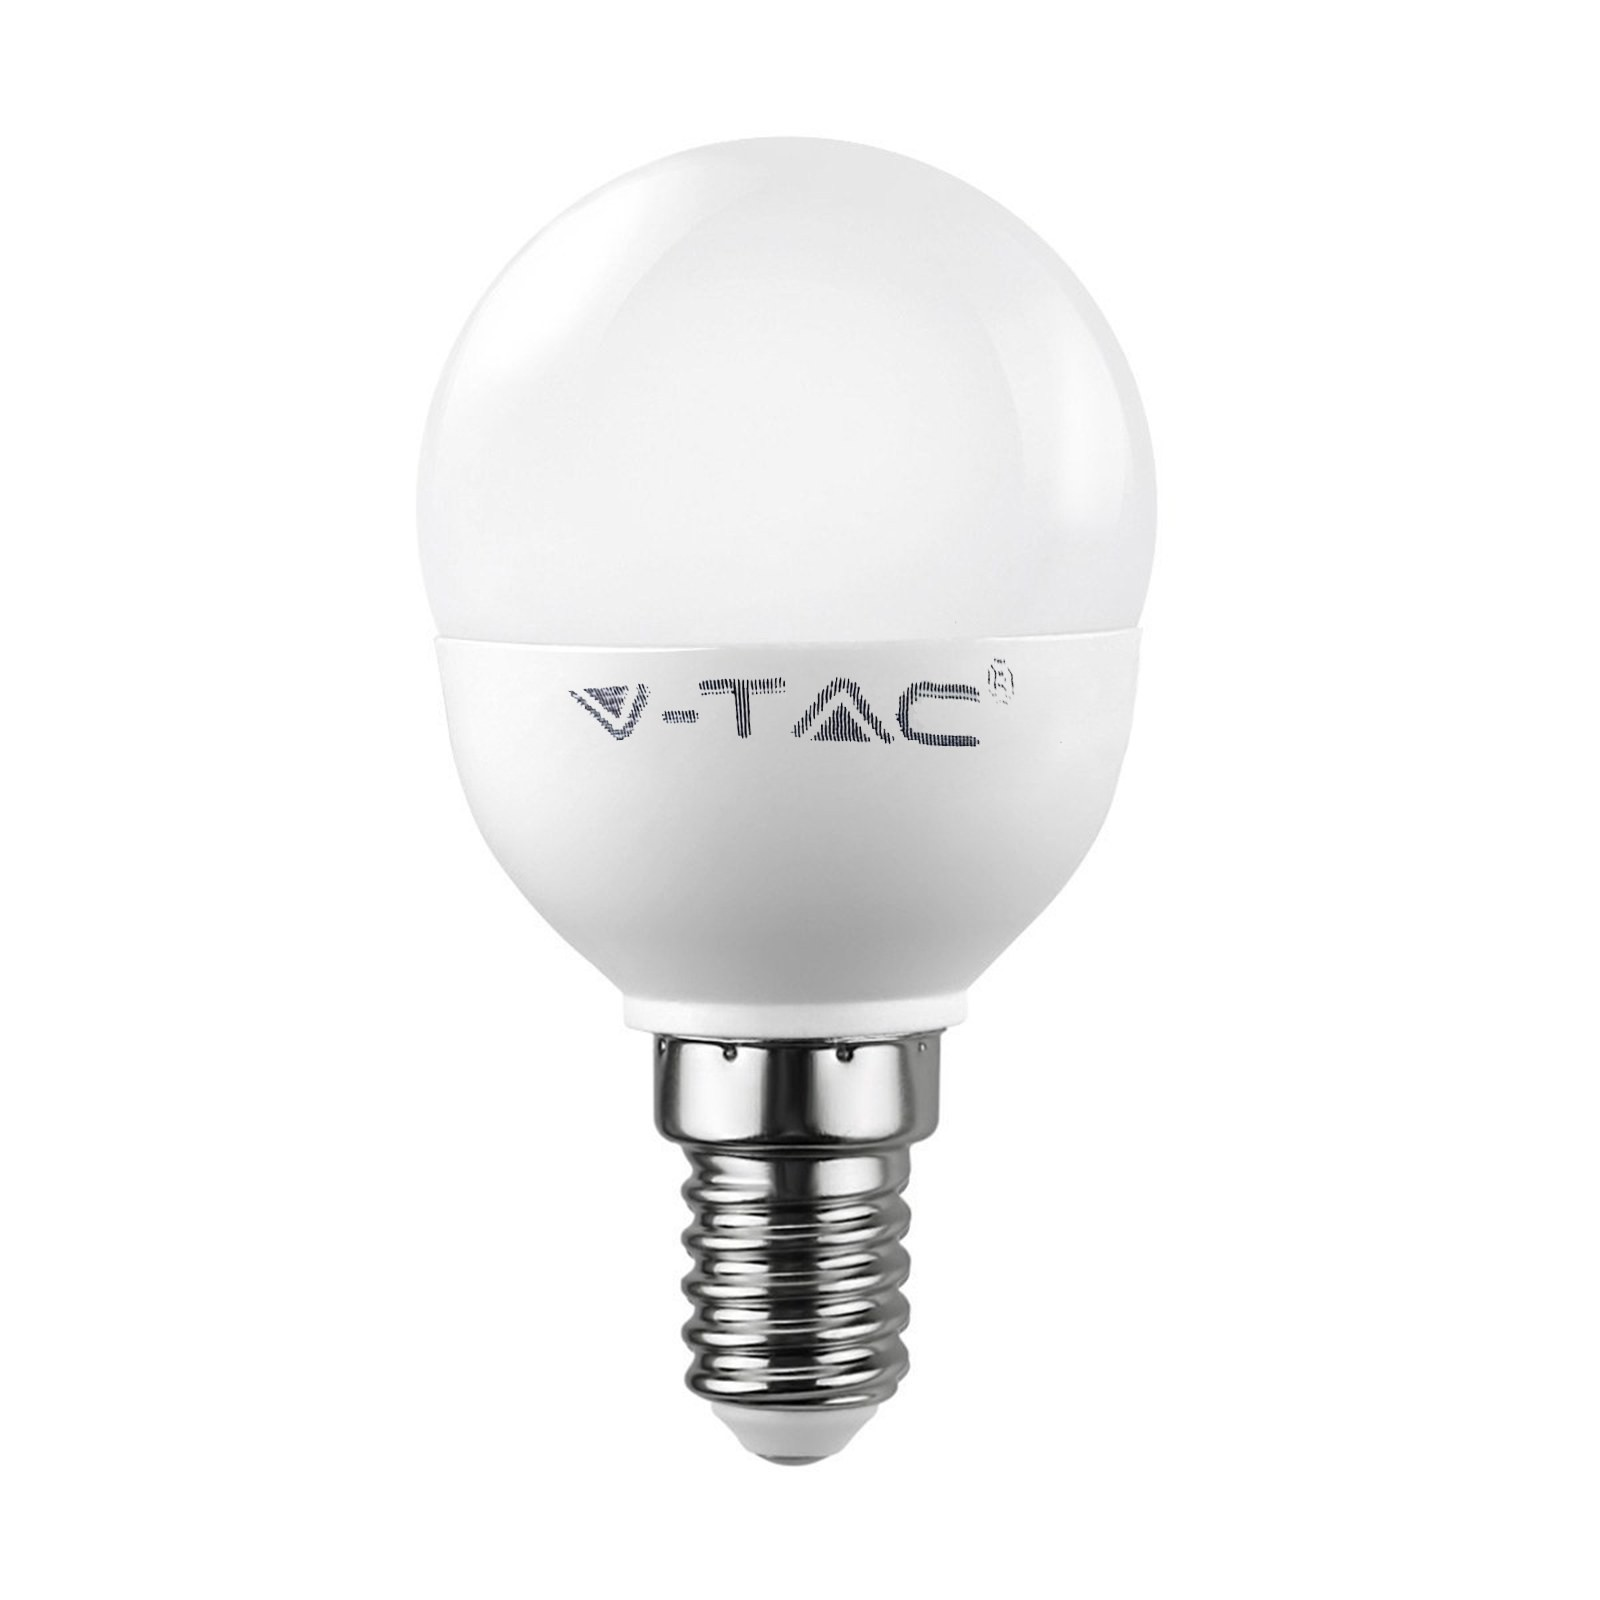 lampada lampadina e14 led smd v tac vt 1880 miniglobo p45 On lampade led 6 watt